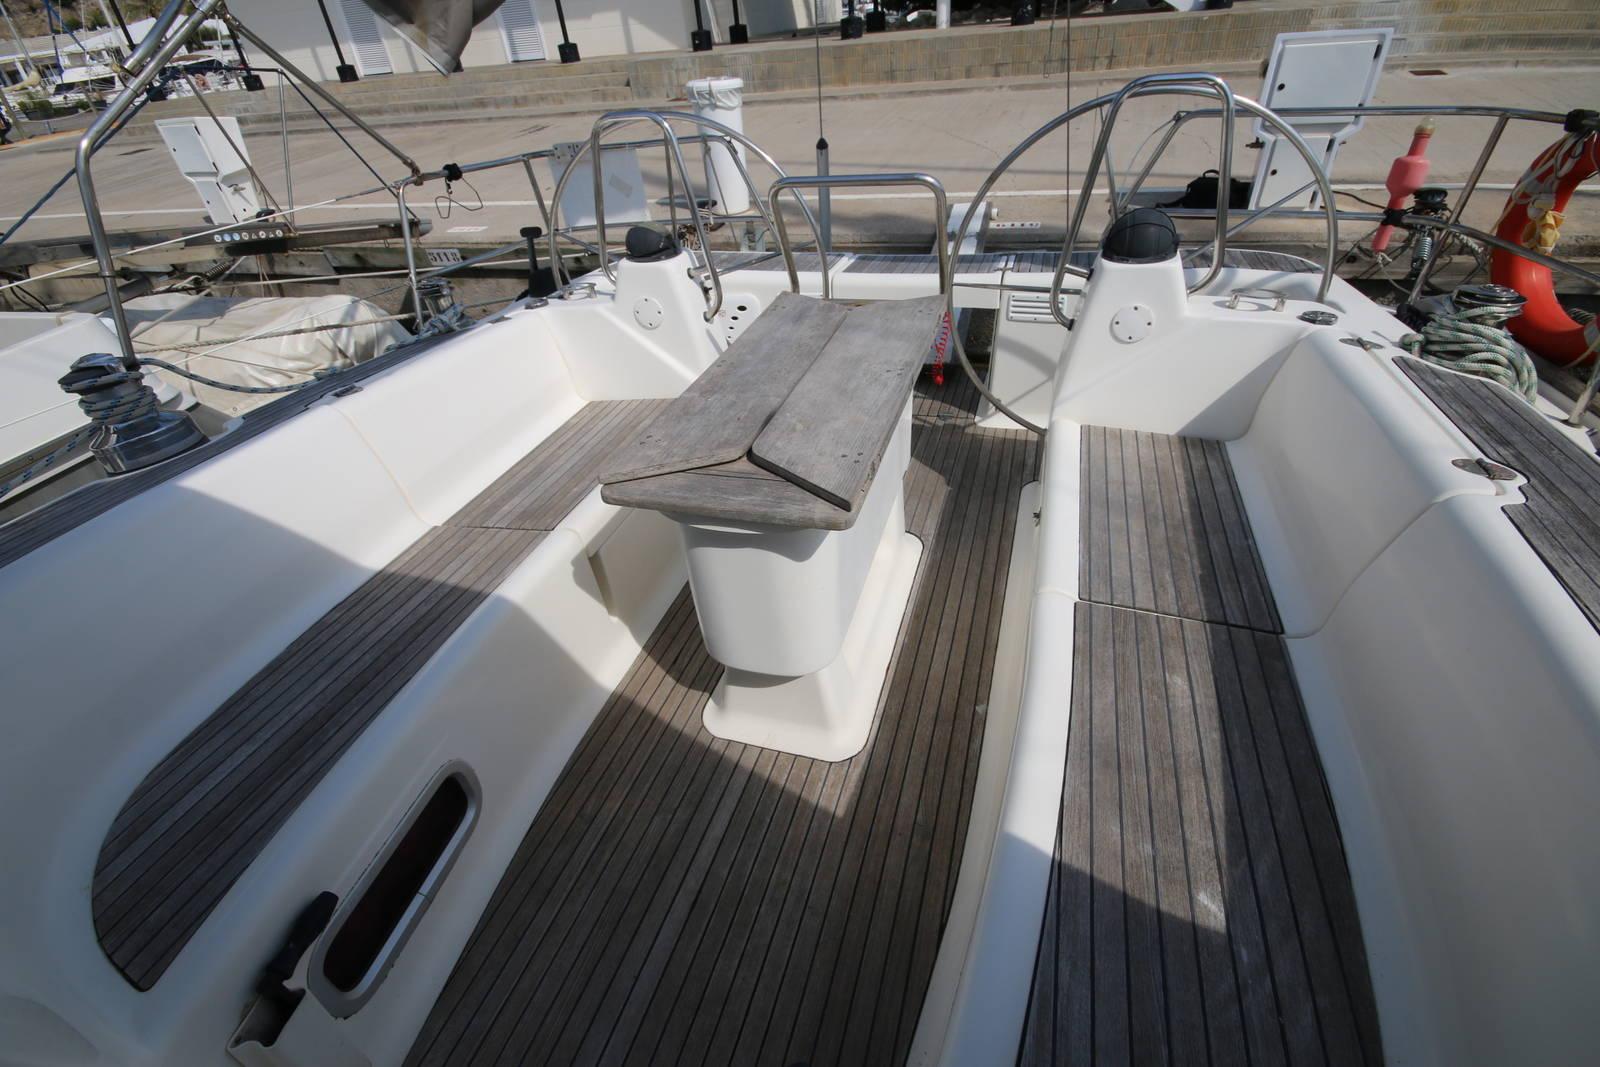 Bavaria 46 Yacht cockpit 2 in the marina